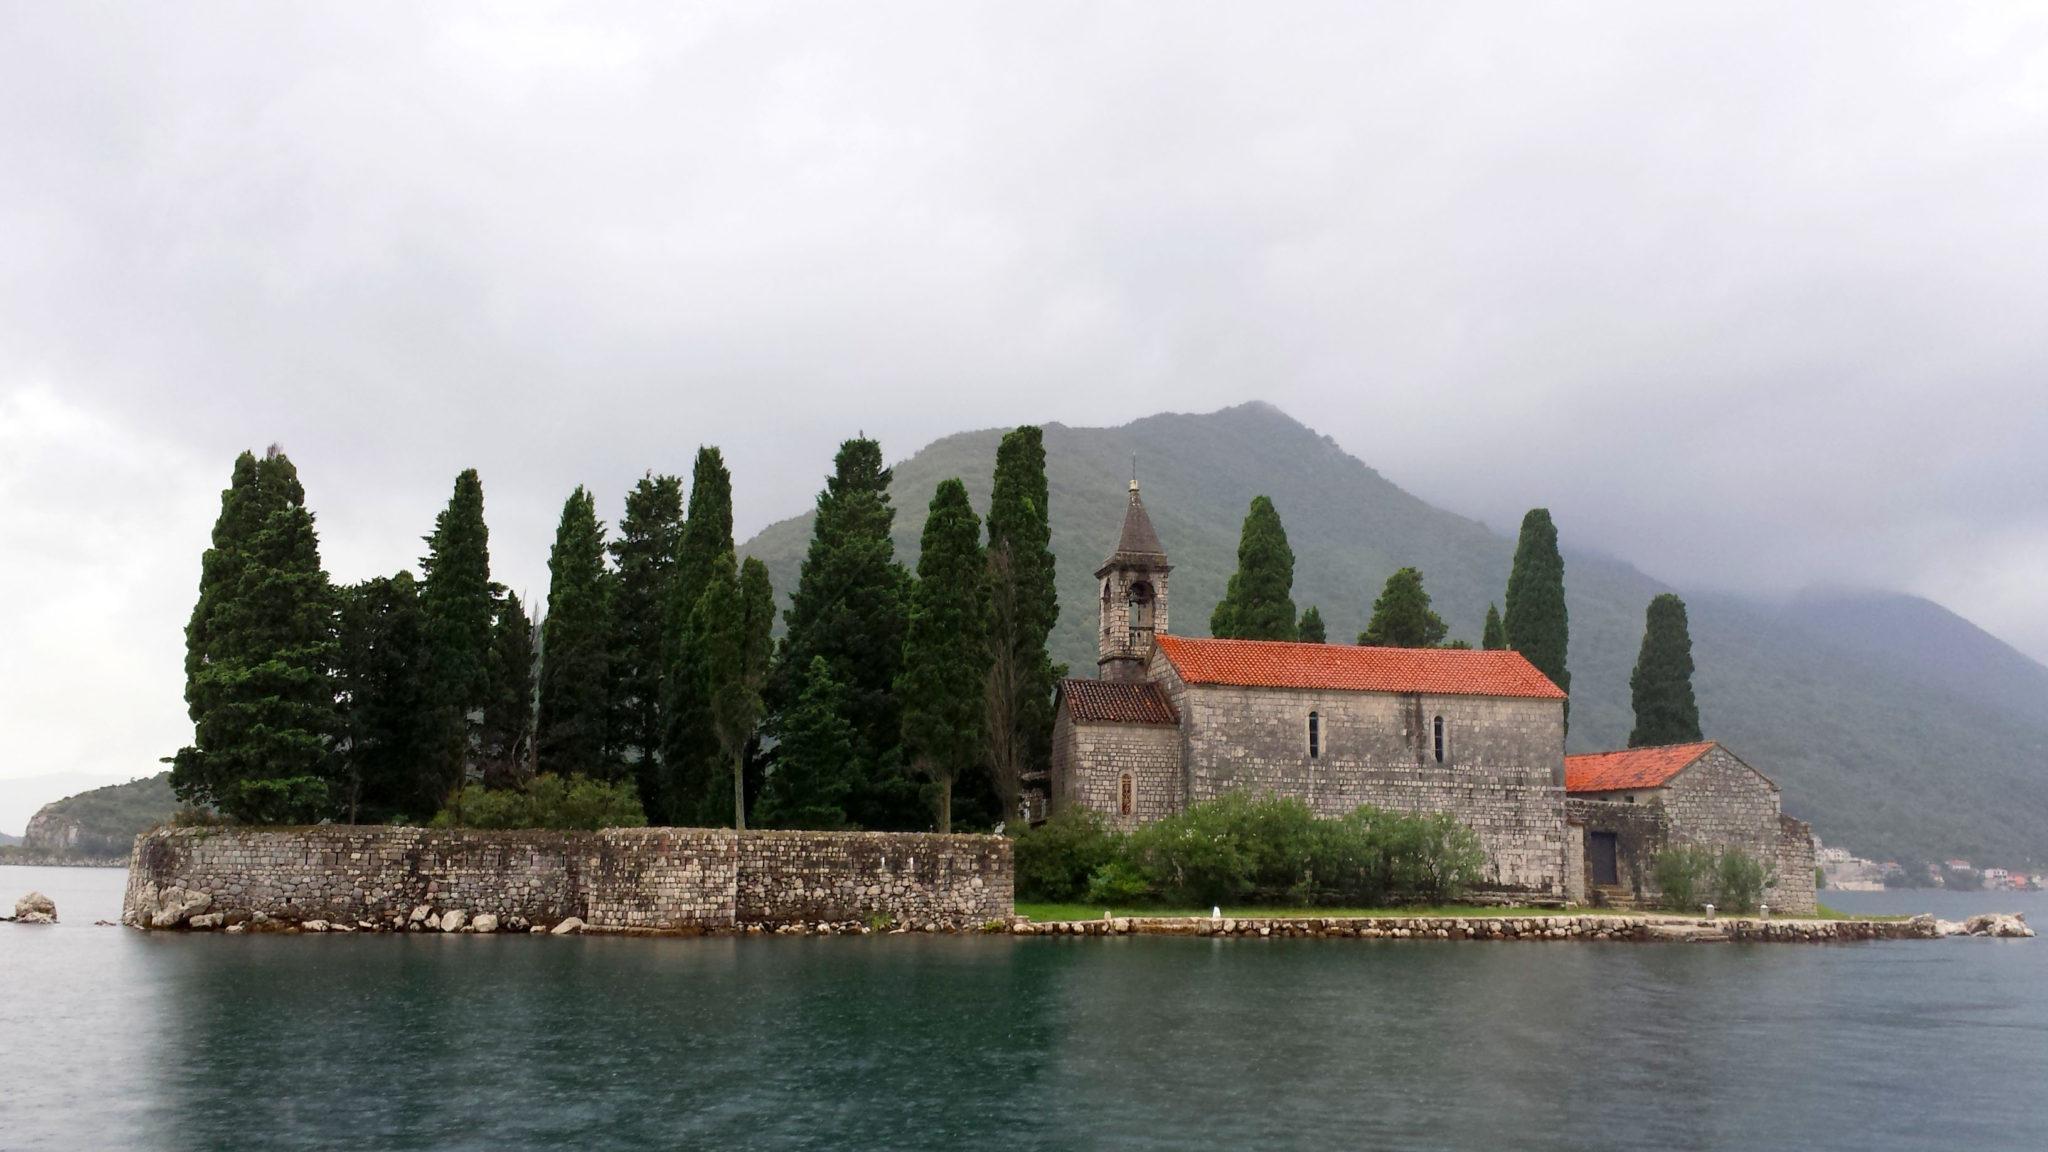 Hema_Montenegro_Perast_sveti_dorde